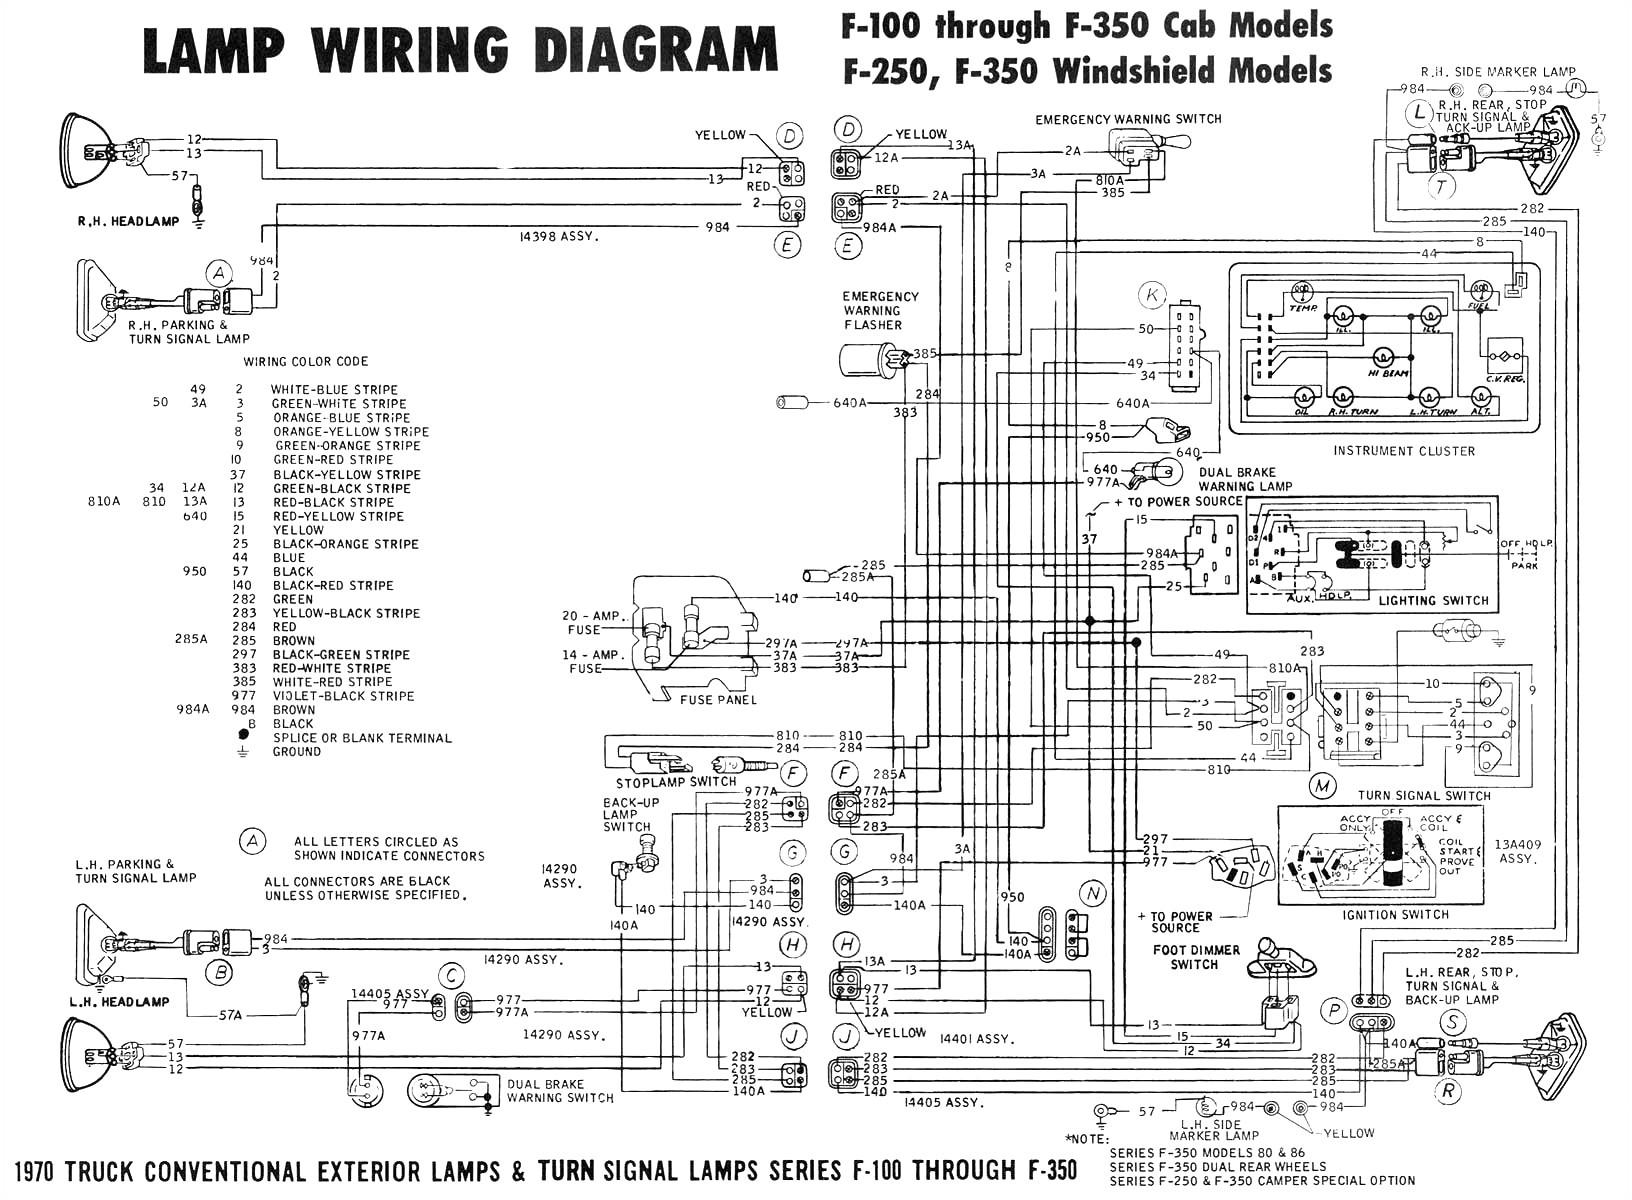 Gm One Wire Alternator Wiring Diagram 2006 ford F350 Wiring Diagram Free Wiring Diagram Article